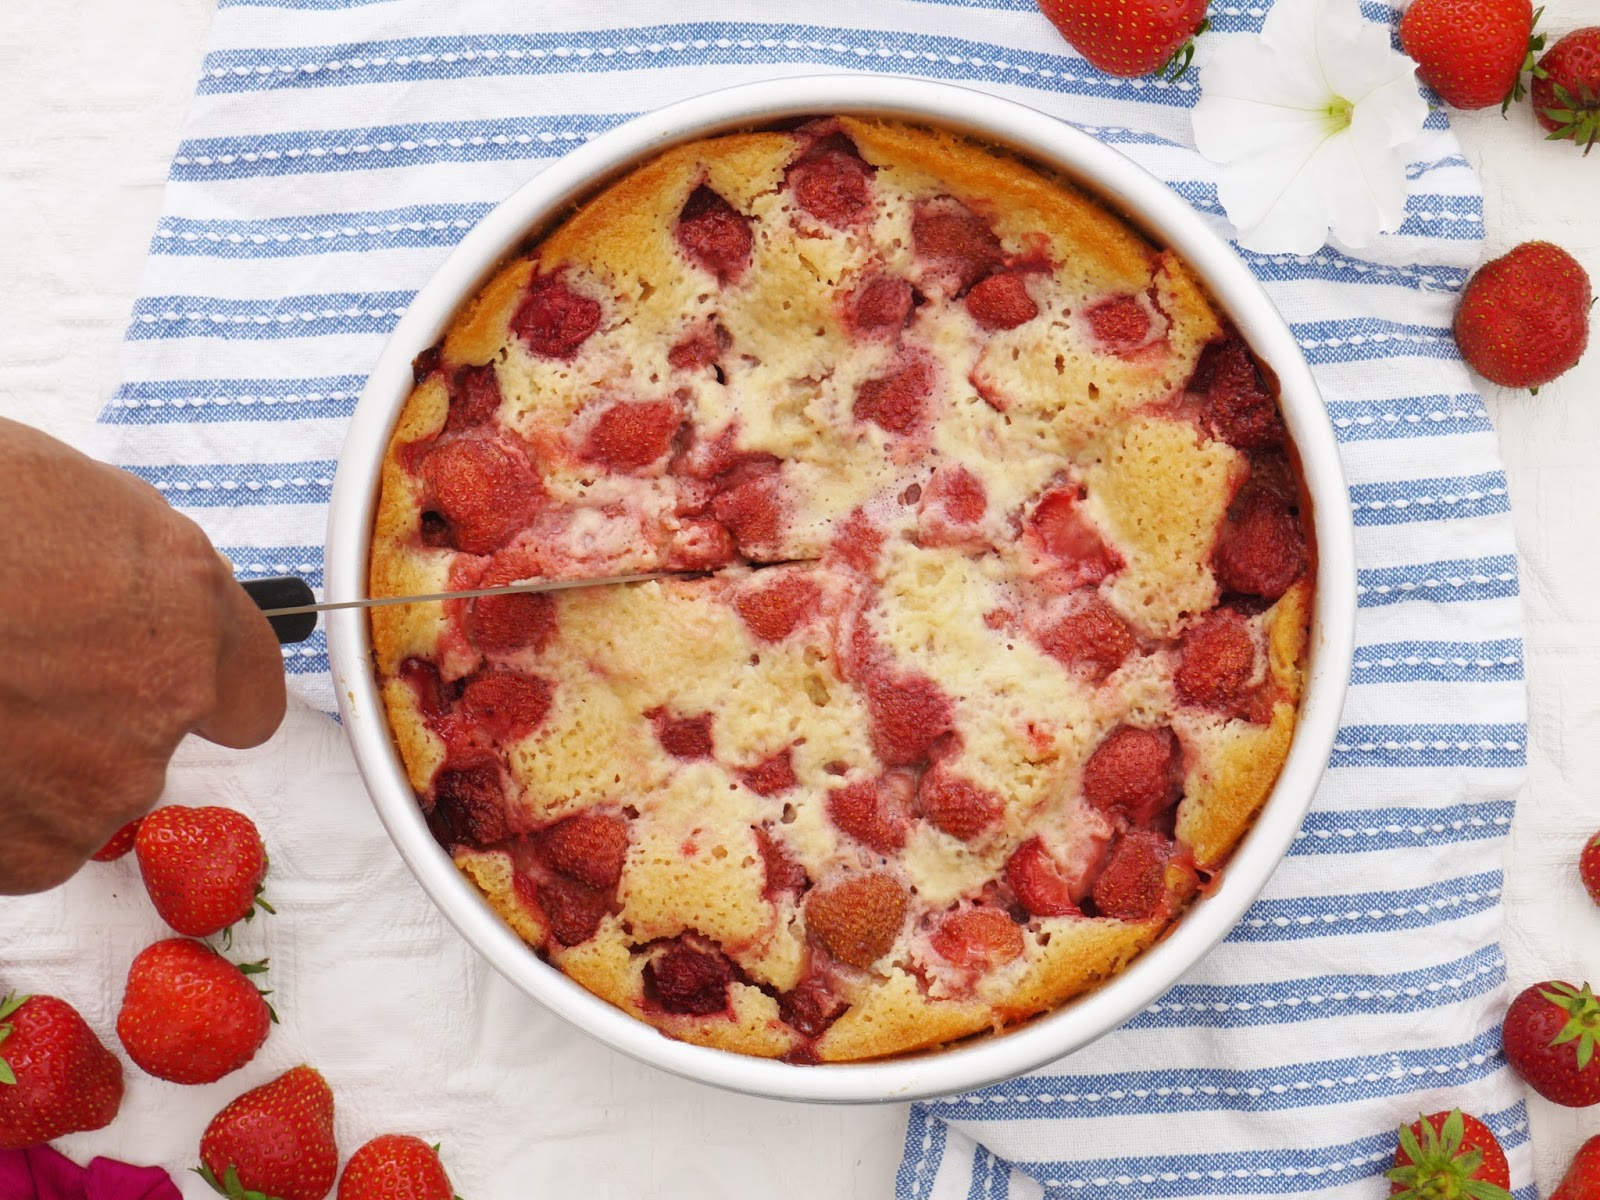 muslim singles in strawberry Greek flip® smooth non-greek kids & tots explore all of the delicious chobani® yogurt choices.